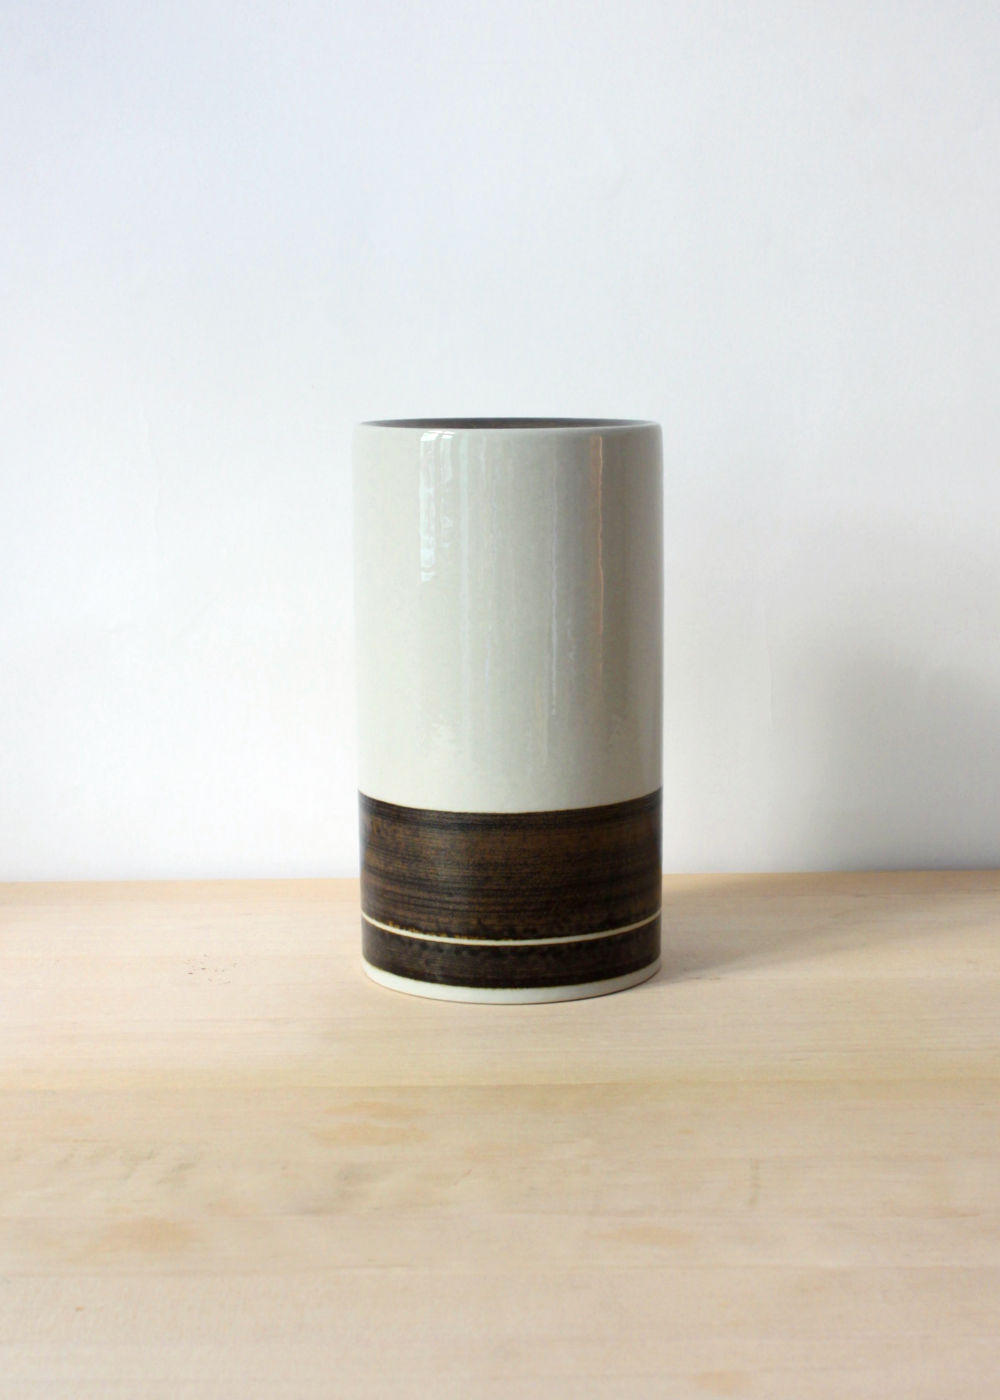 Peter-Winquist-tall-vase-01